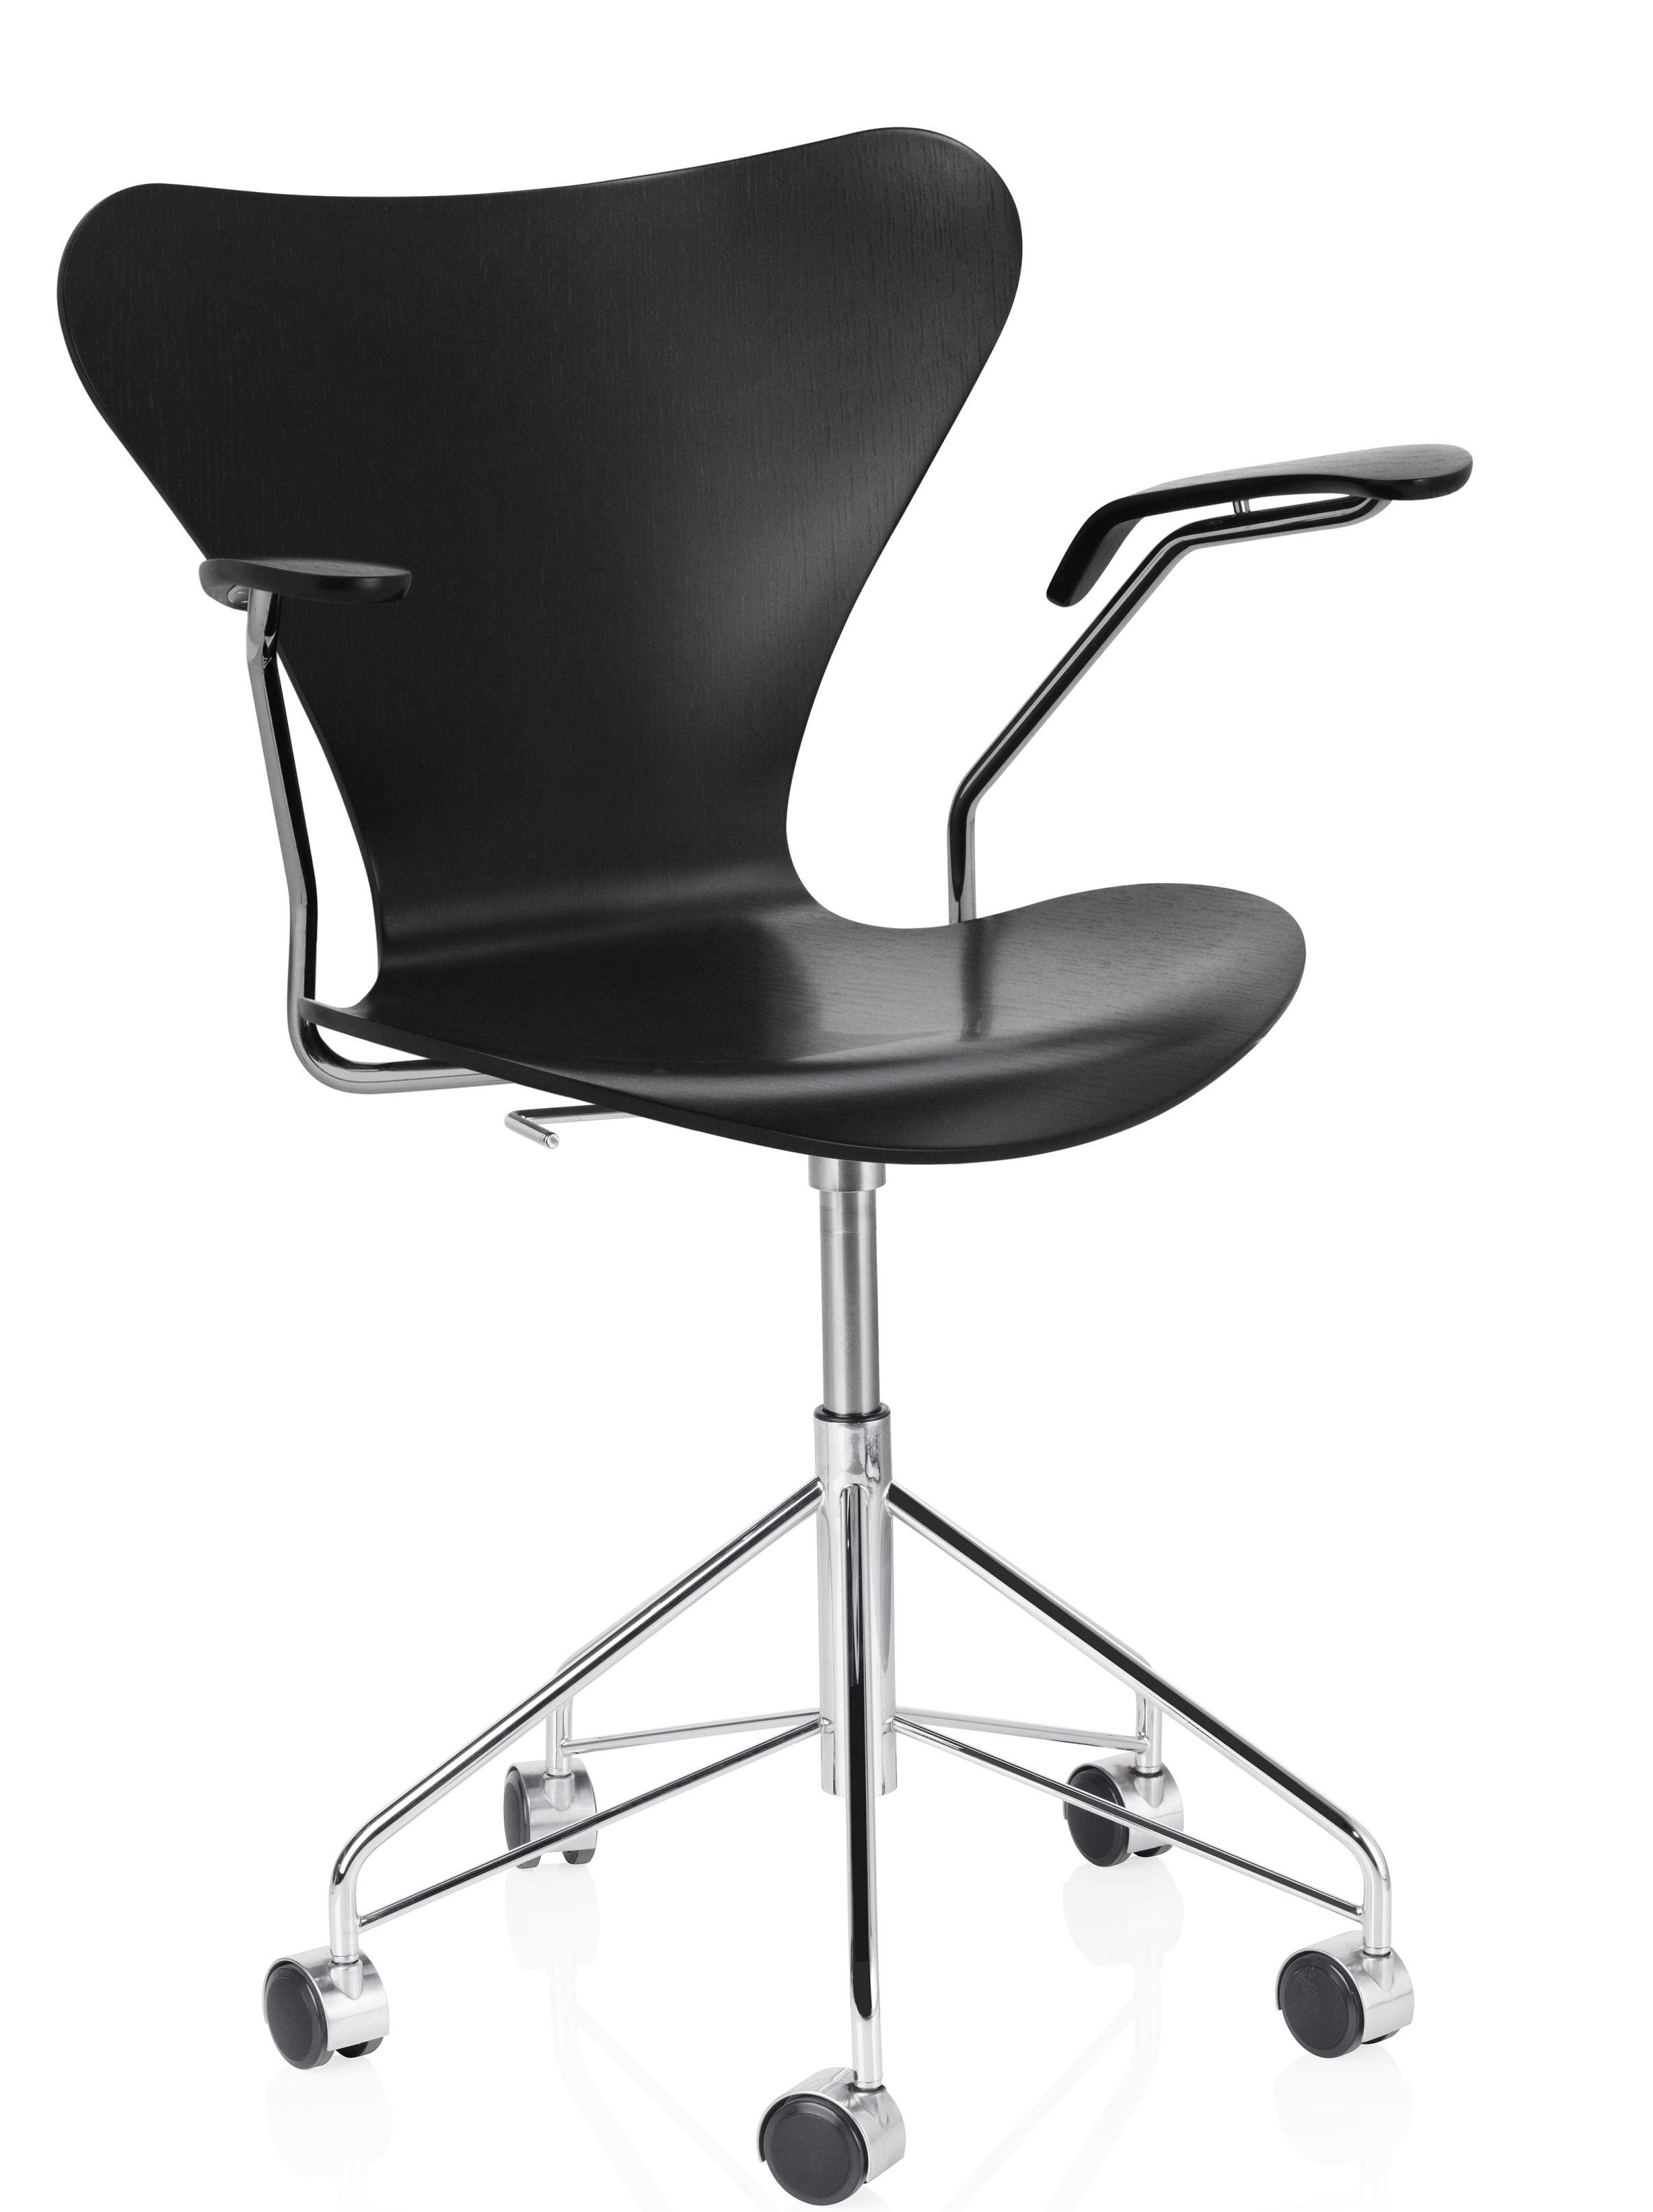 Series 7 Swivel chair 3217 Fritz Hansen